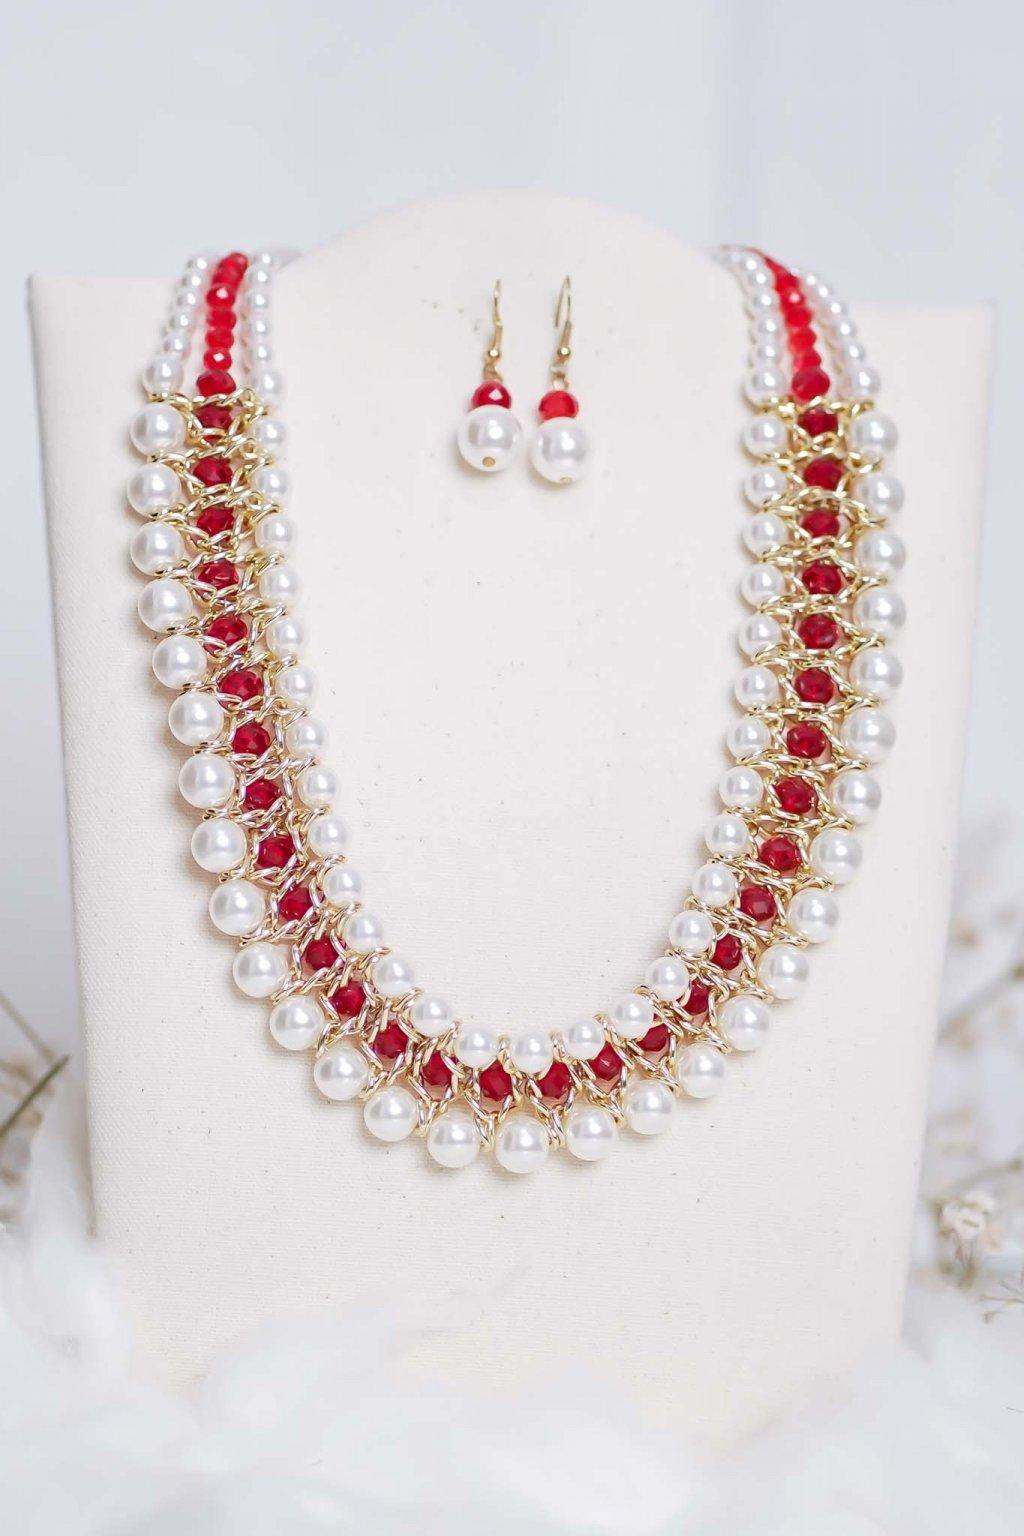 náhrdelník, šperk, spoločenská náhrdelník, náhrdelník na bežný deň, výrazný náhrdelník, jemný náhrdelník, šperky, náhrdelník na ples, svadbu, stužkovú 62